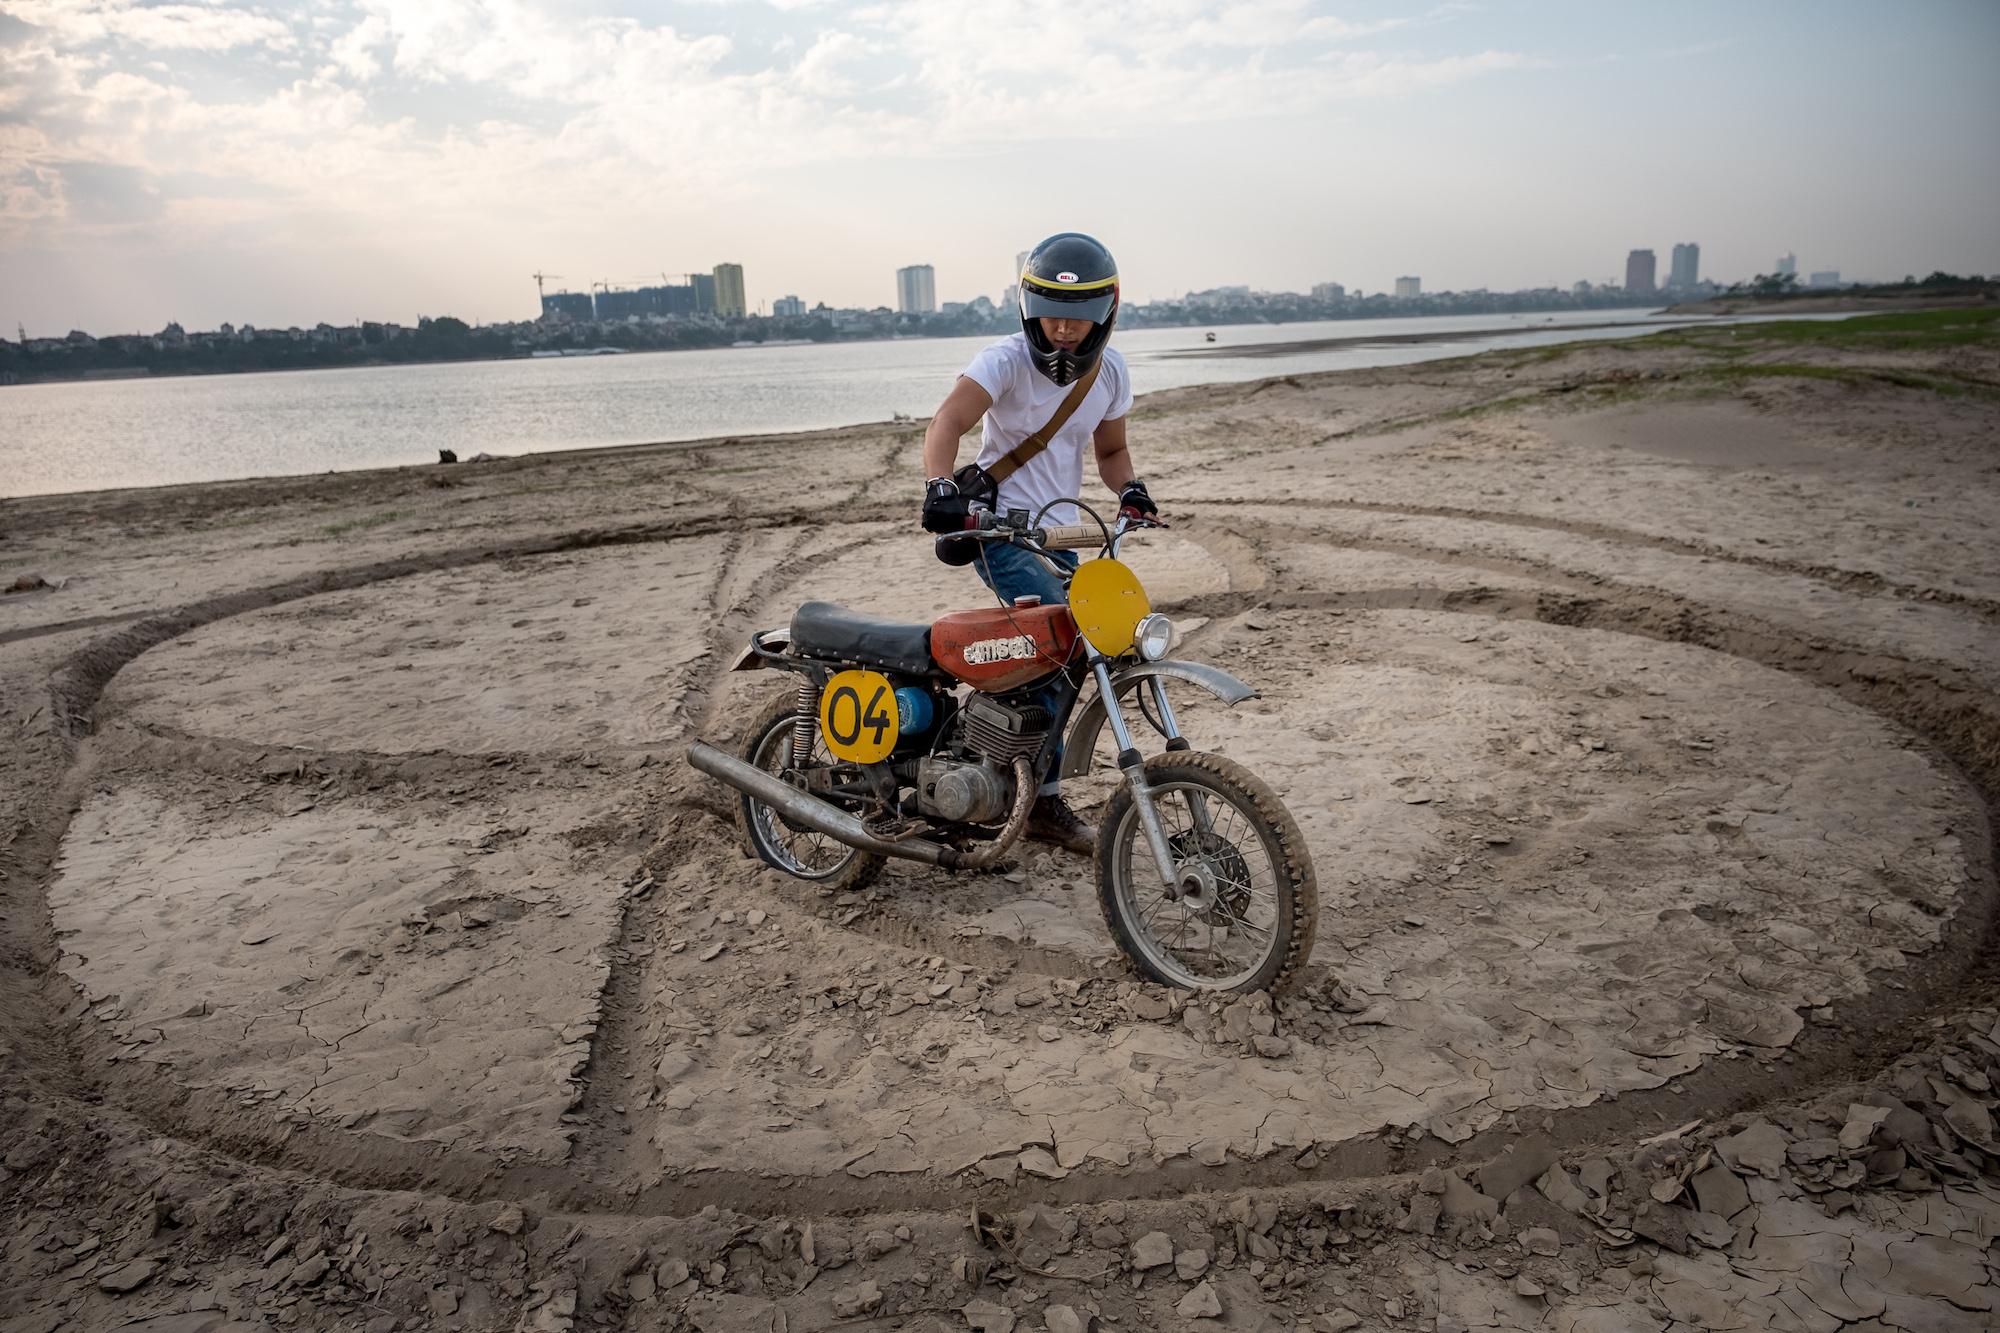 Minsk Motorcycles Make A Comeback In Hanoi Cnn Travel 1970 Honda 75cc Motorcycle